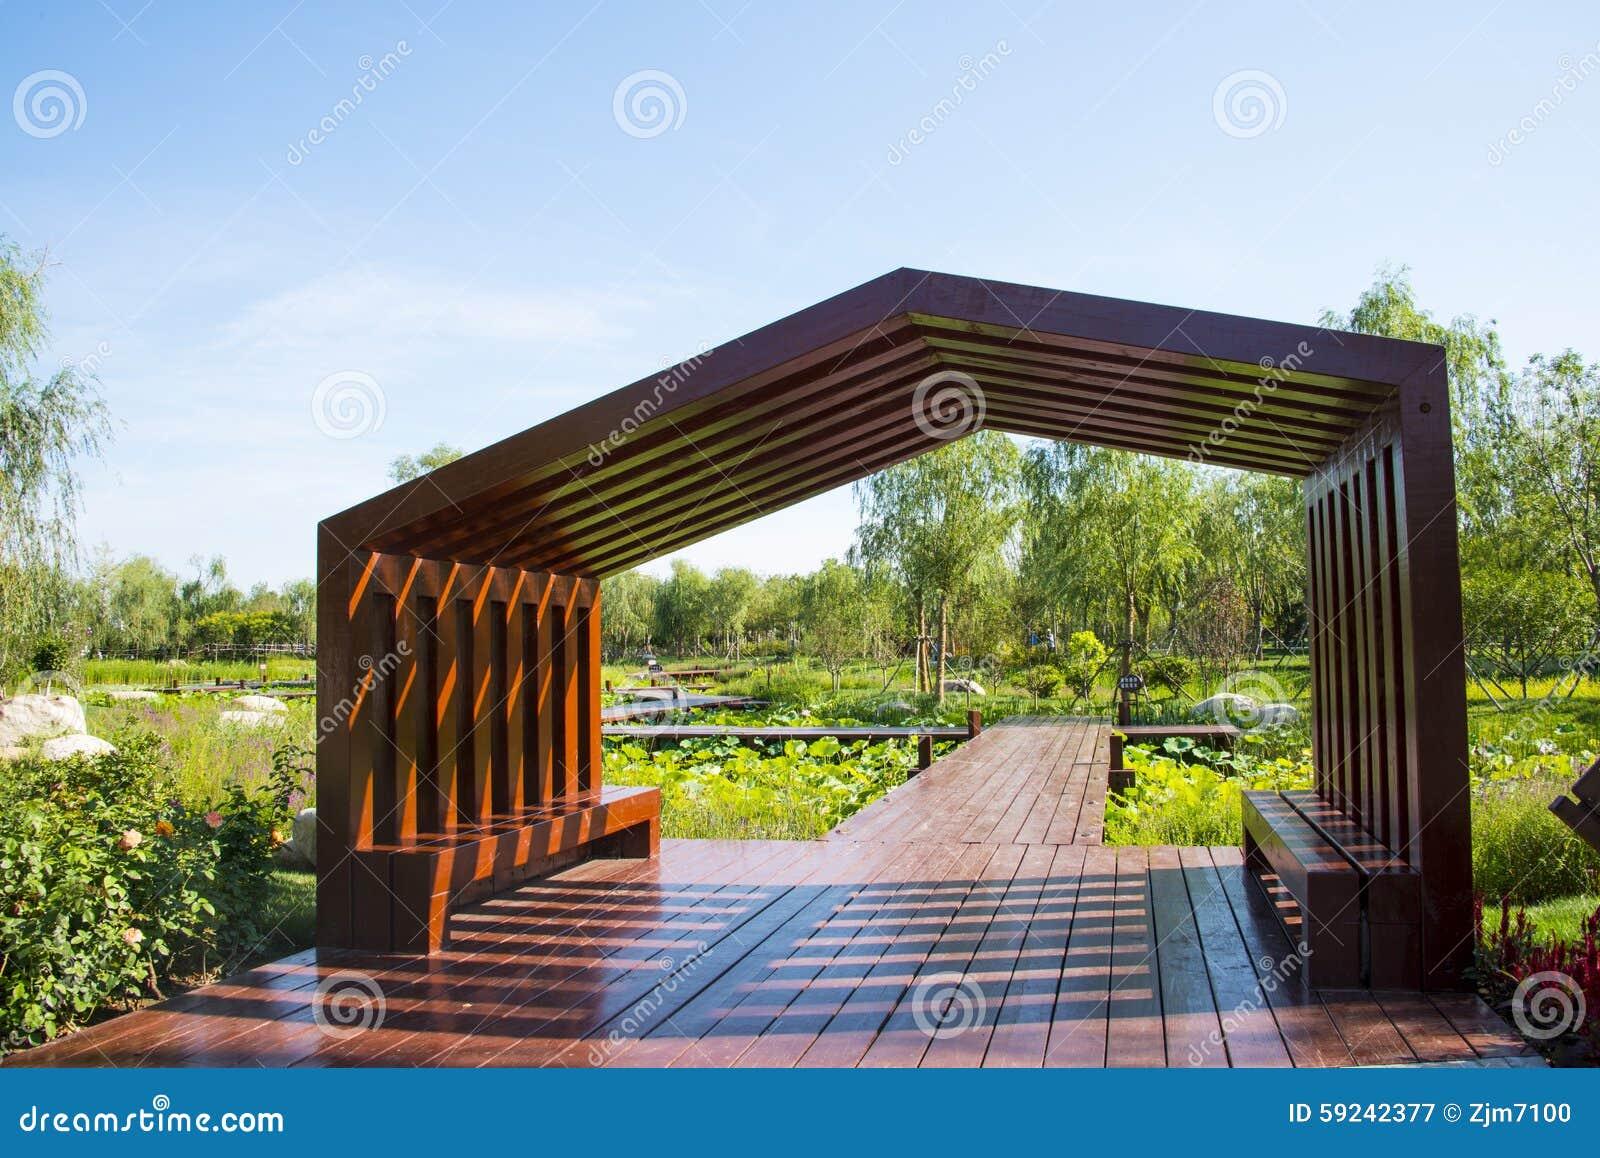 Asia China, Wuqing, Tianjin, expo verde, arquitectura del jardín, galería del pabellón,